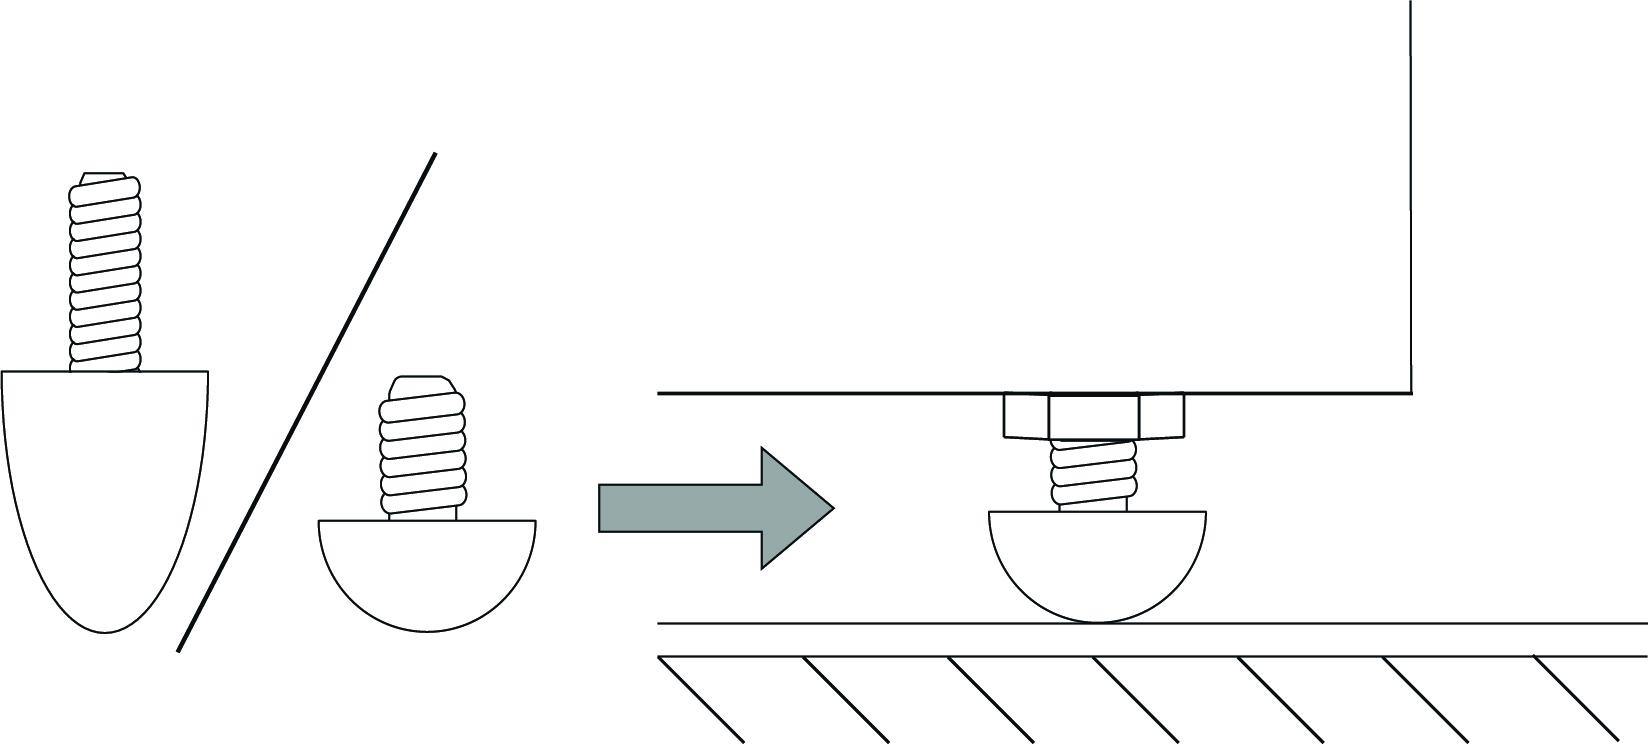 Feet diagram pontiac grand prix wiring diagram stihl fs45 parts db series subwoofer foot options dbd feet rubber db series subwoofer foot options feet diagram feet diagram pooptronica